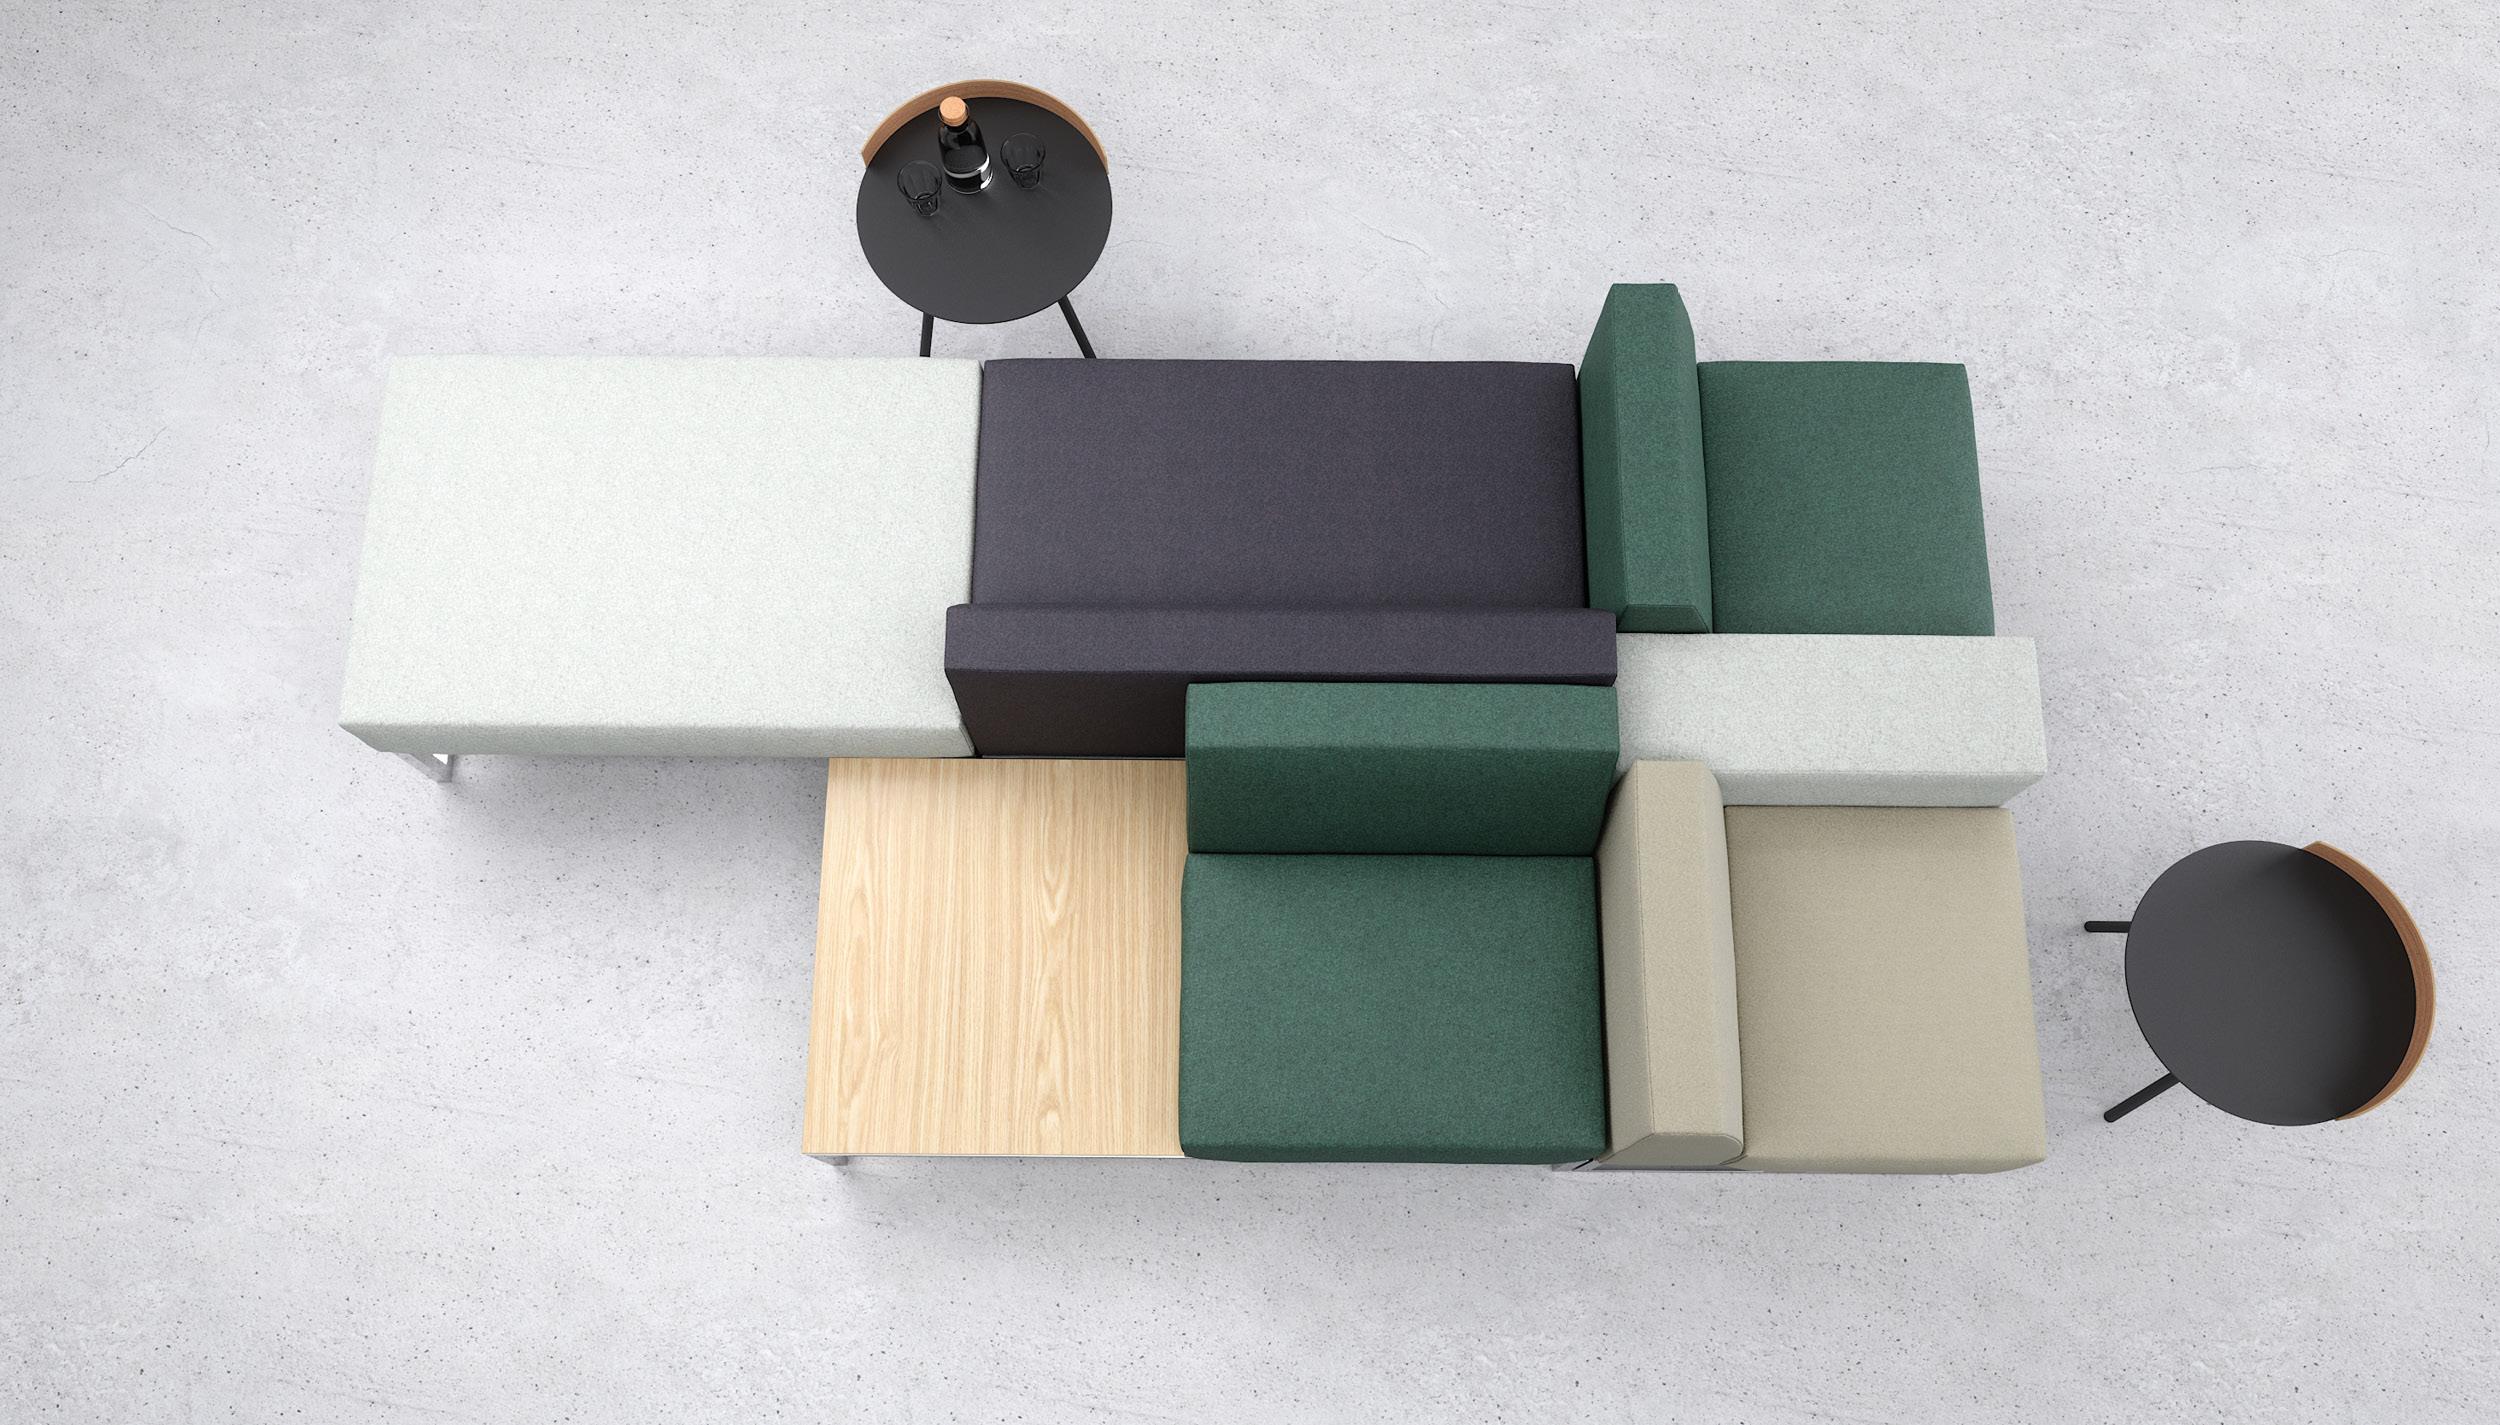 casala palau bricks elements fence table mood image